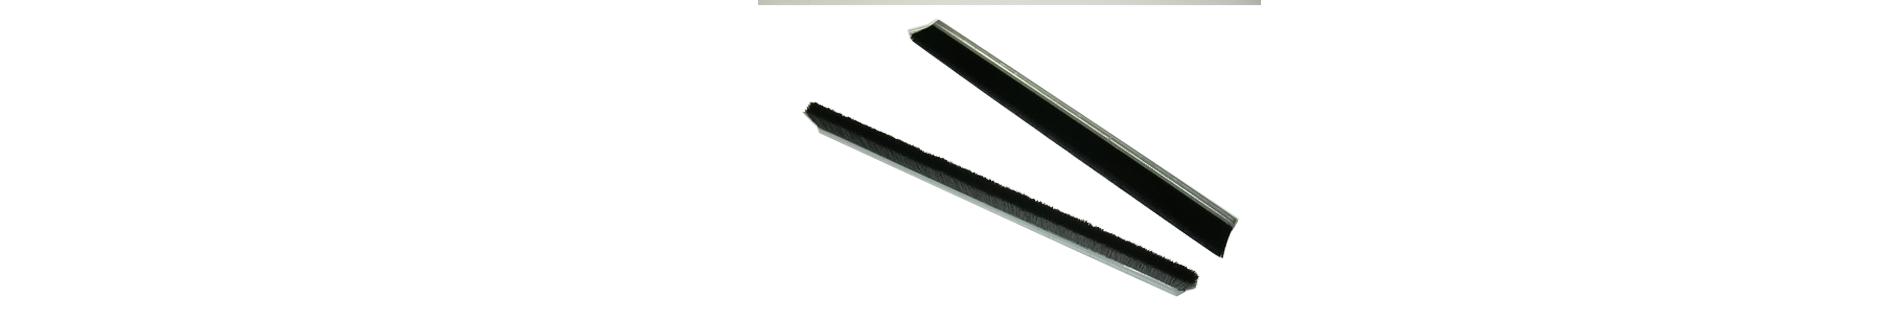 conveyor brushes